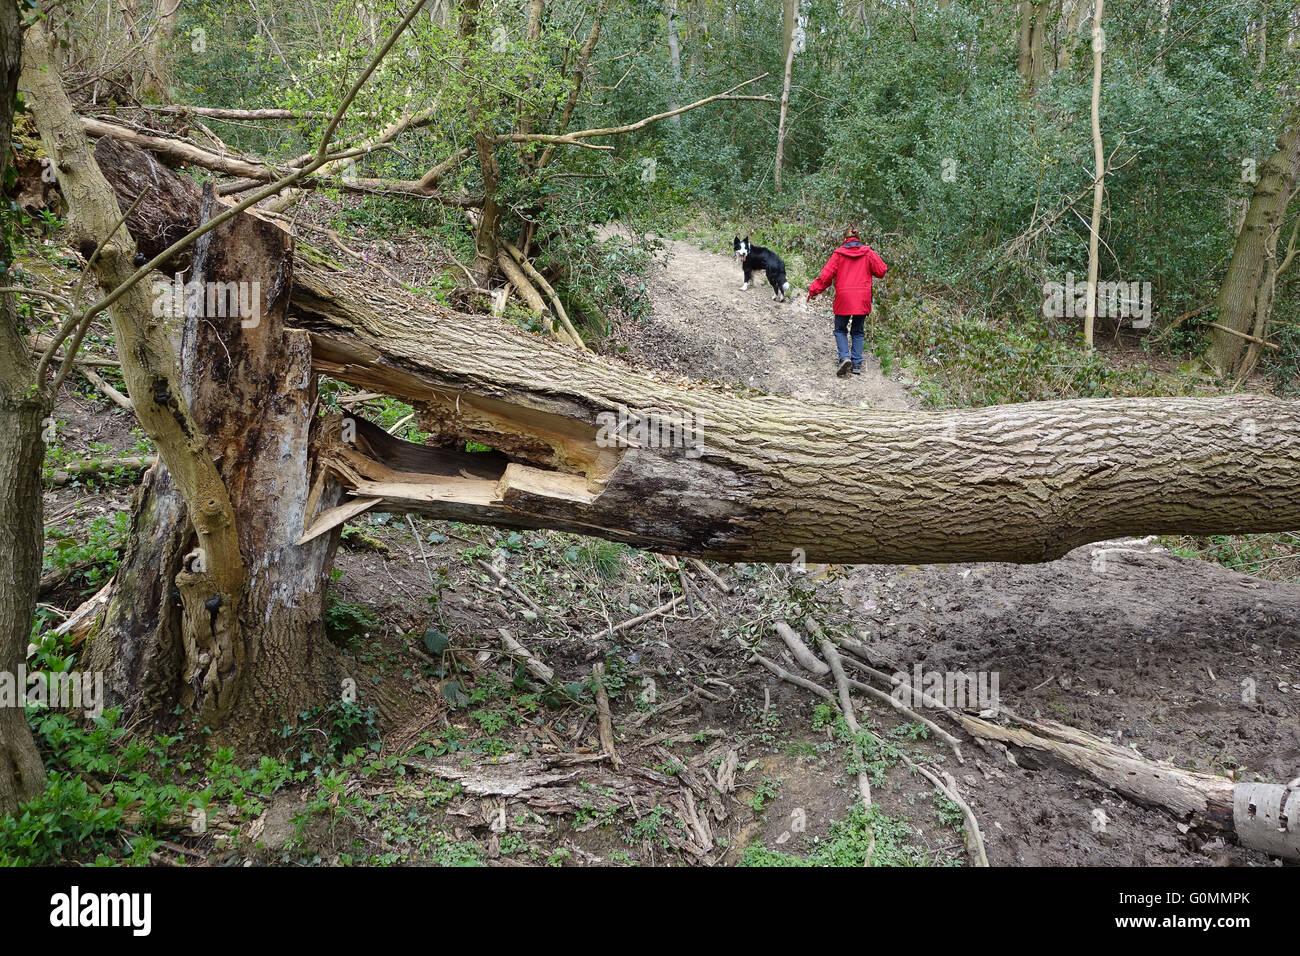 Fallen diseased Ash Tree in Shropshire Woodland England Uk - Stock Image